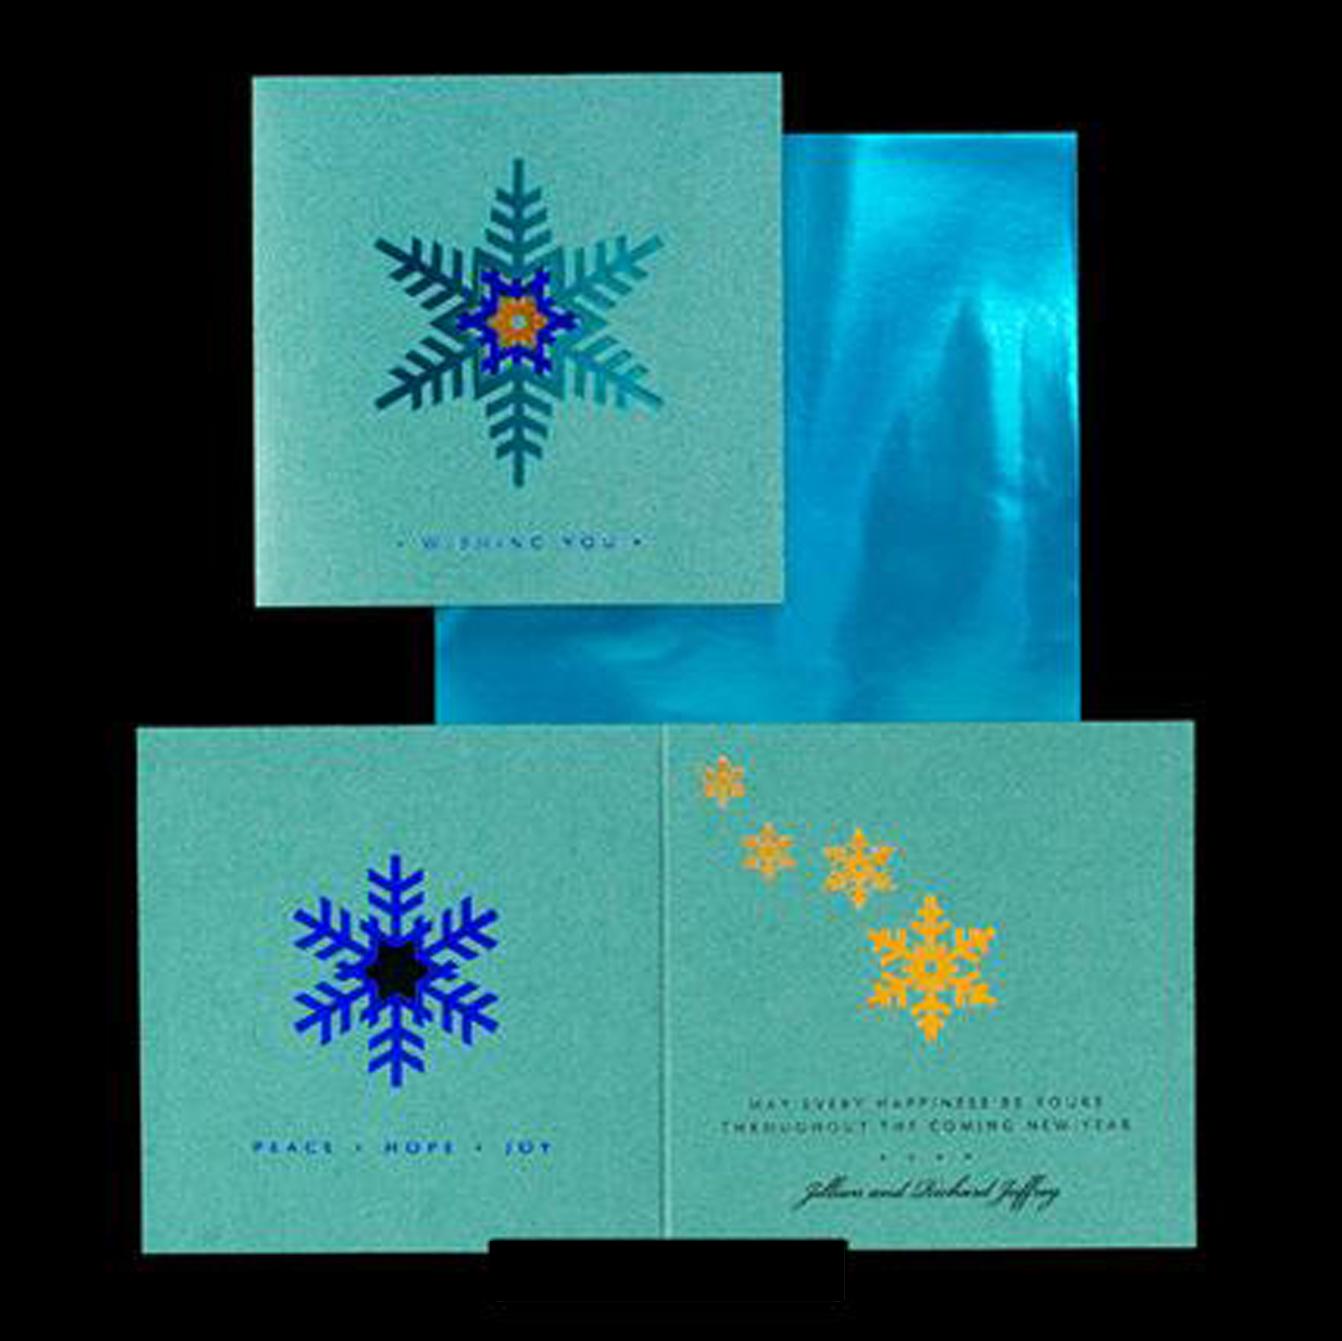 Pin tarjetas creativas hechas mano ajilbabcom portal on - Postales navidenas creativas ...